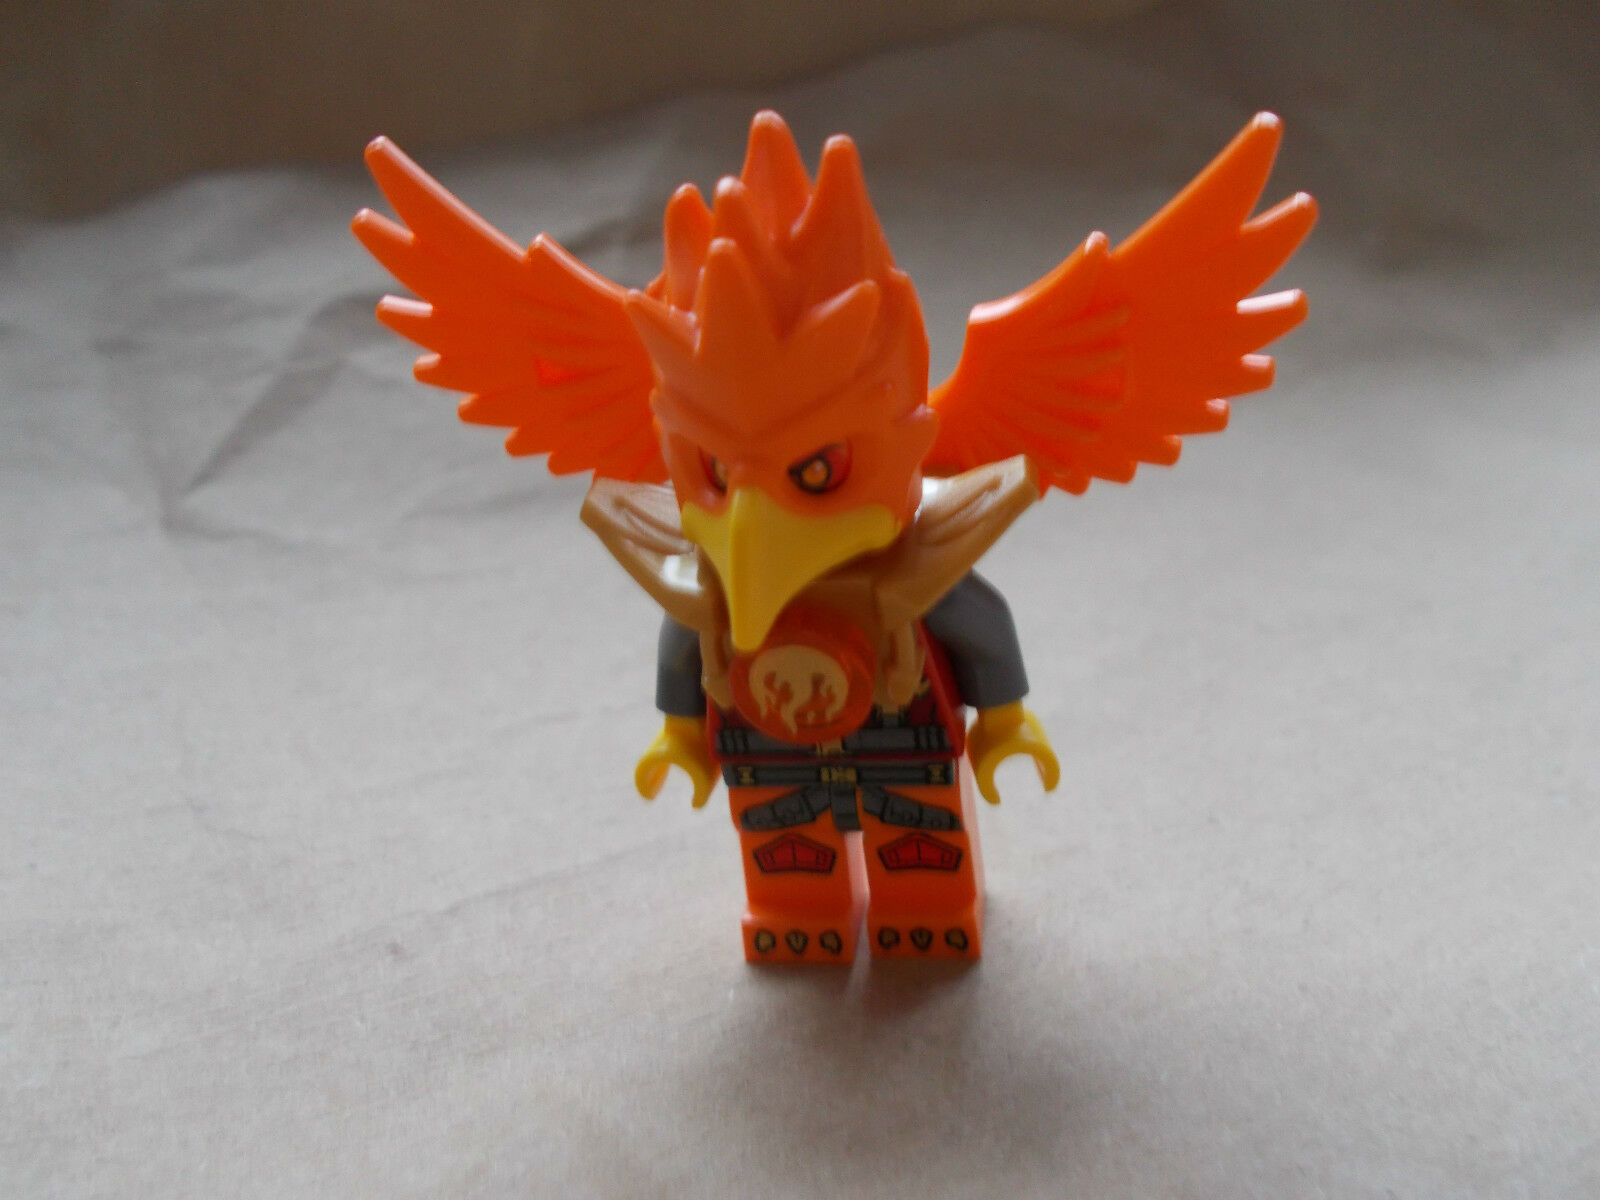 NEW LEGO Bulkar FROM SET 70223 LEGENDS OF CHIMA LOC134